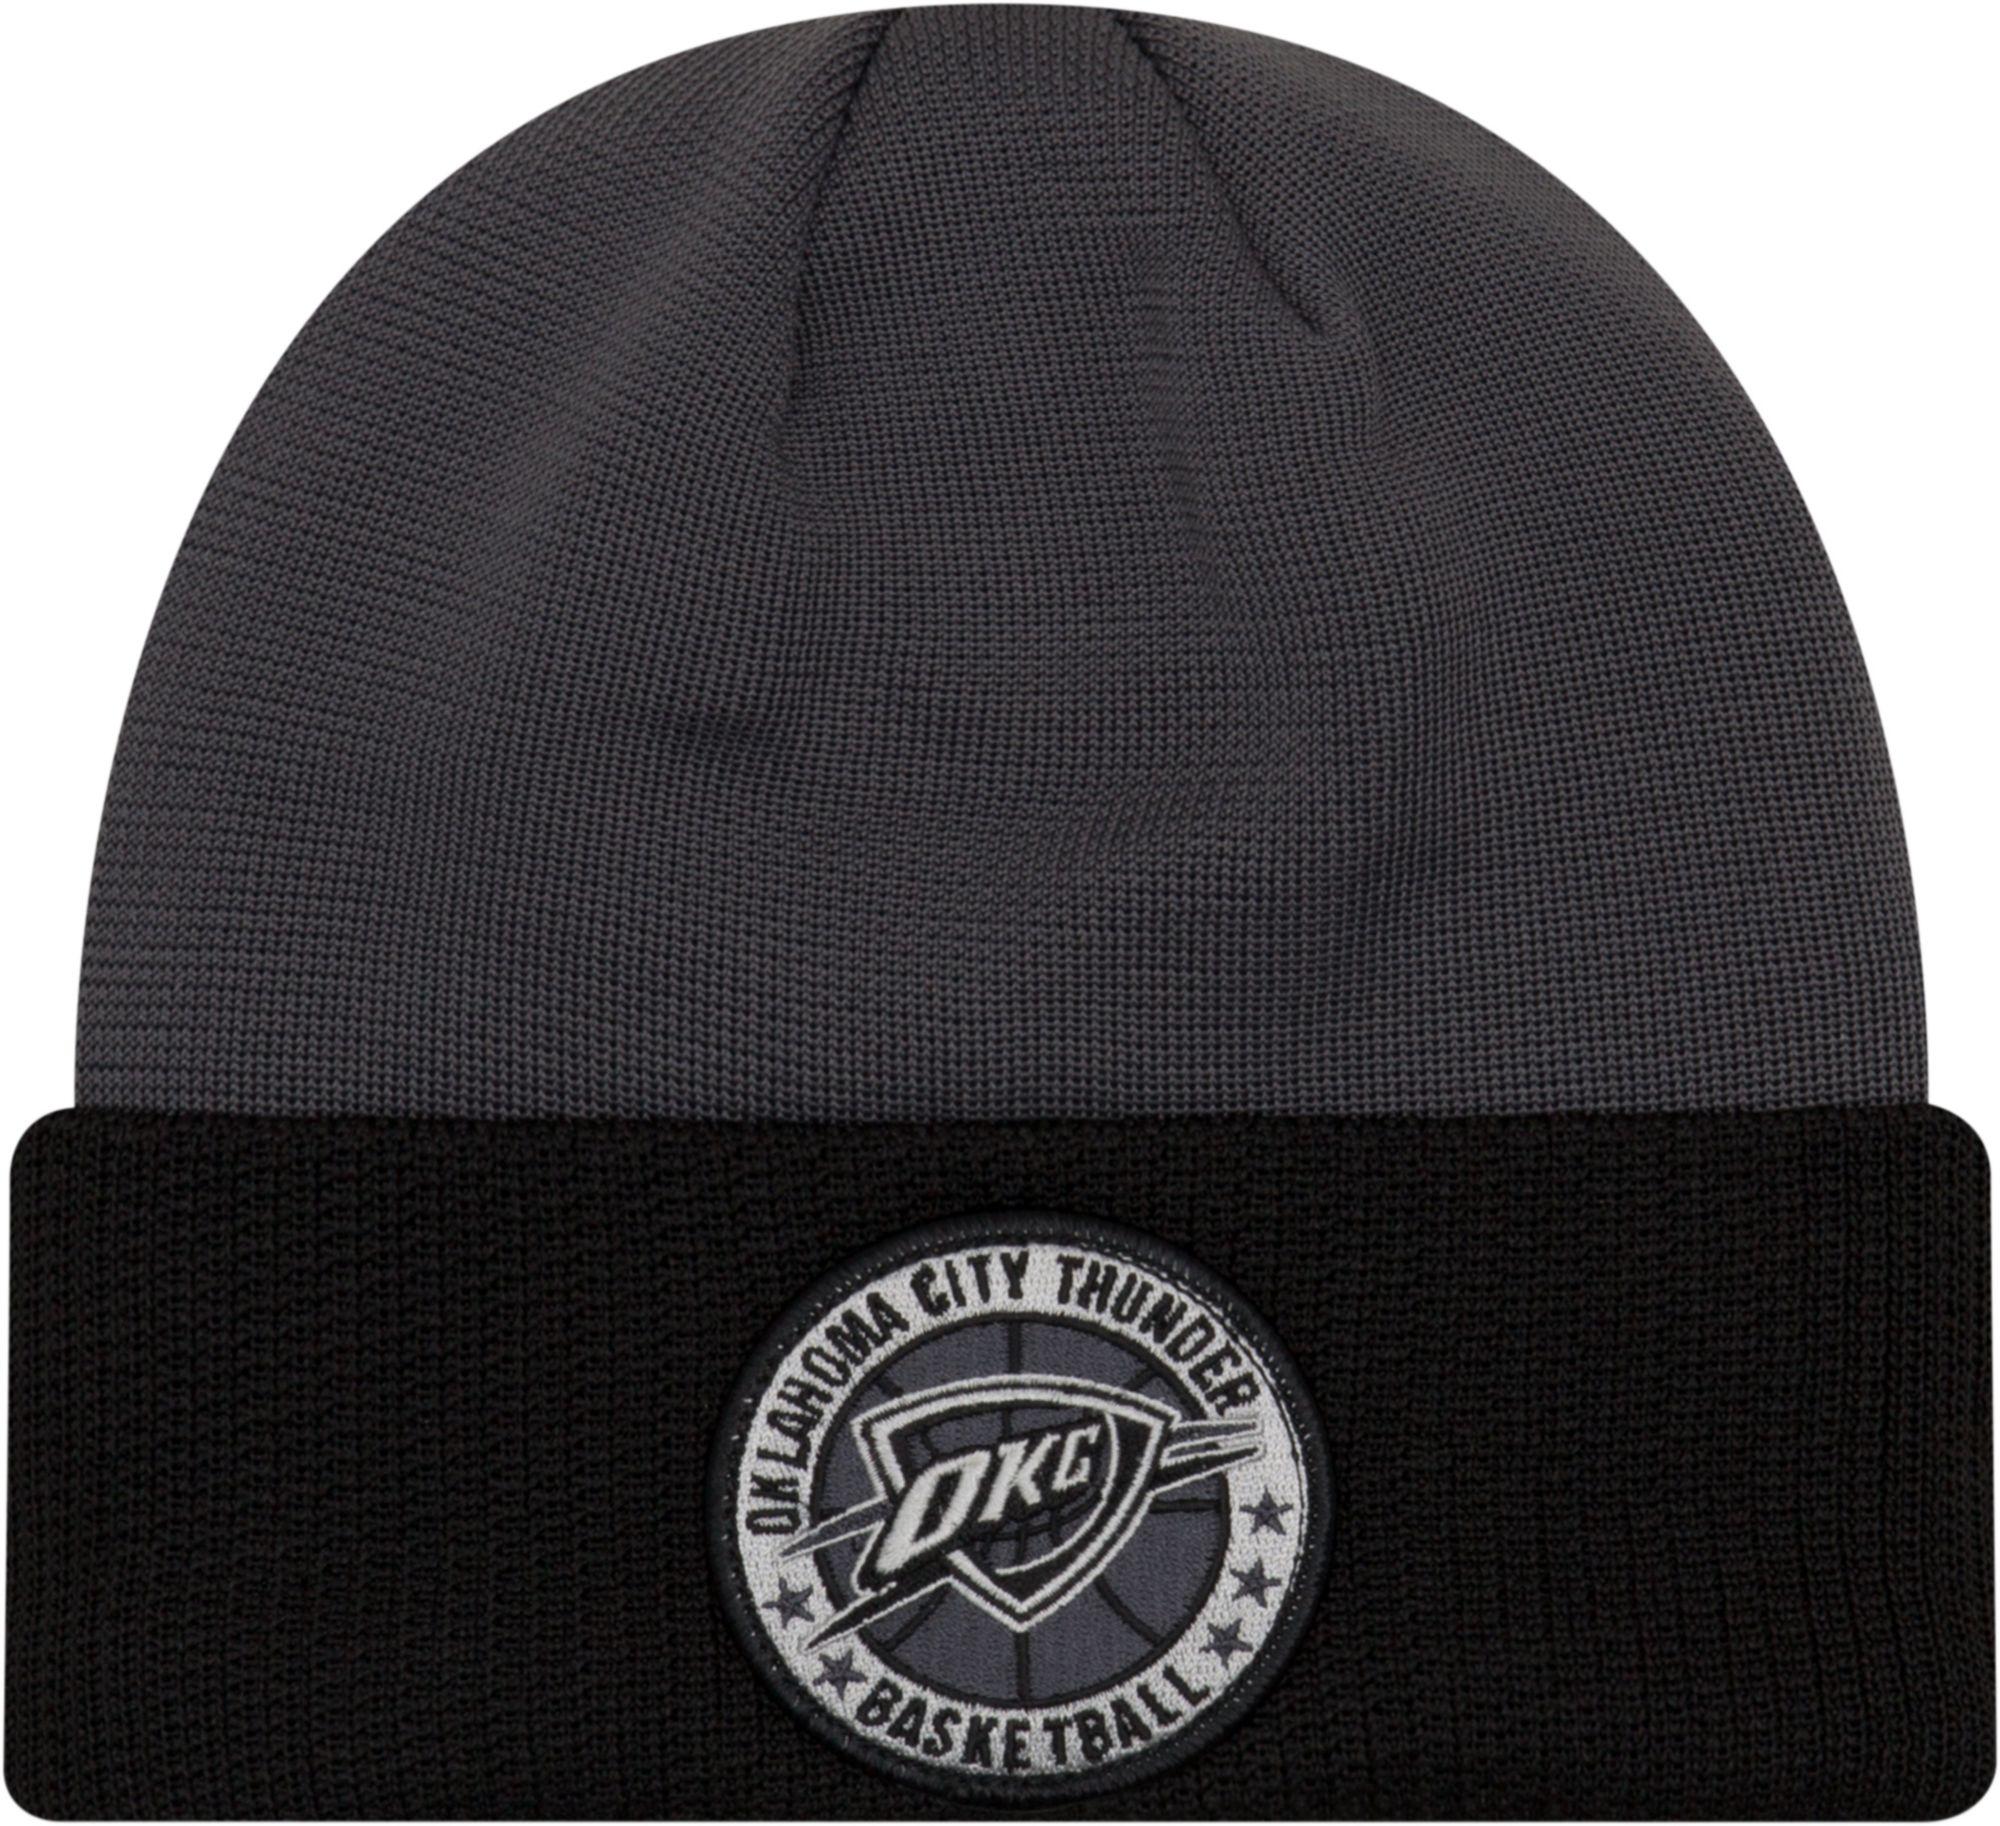 d5b381454a5 ... pom cuffed knit hat 8ba5e 3d95b  coupon for new era mens oklahoma city  thunder on court knit hat e6246 66cff